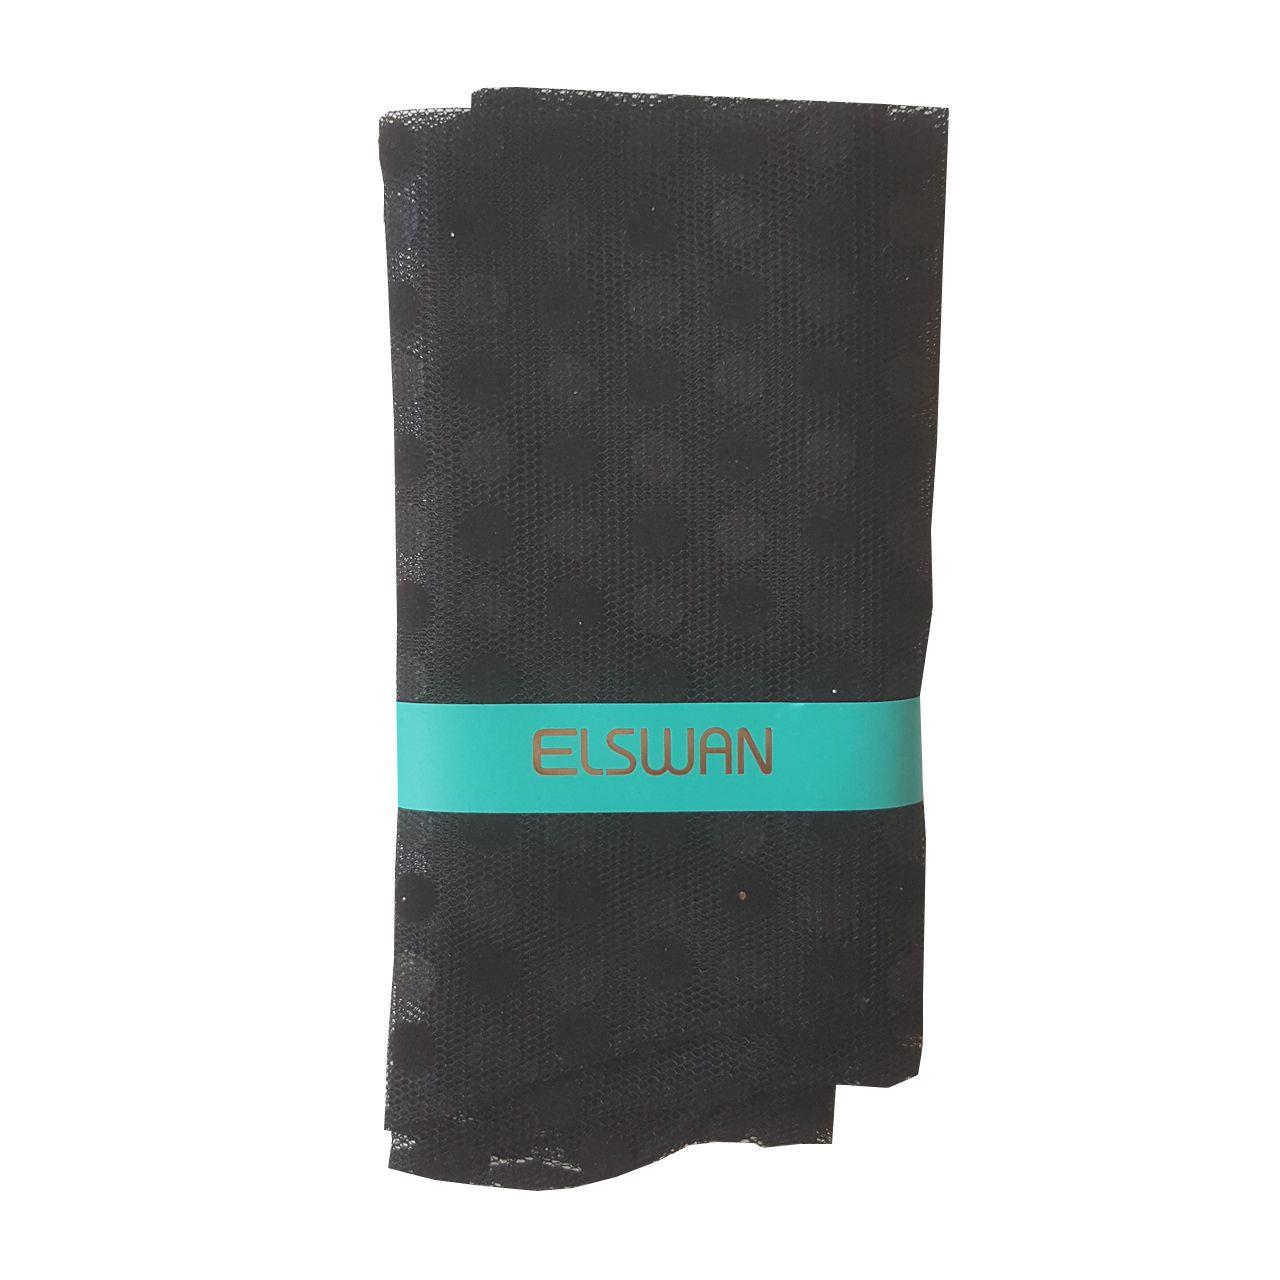 جوراب زنانه ال سون کد PH324 -  - 3